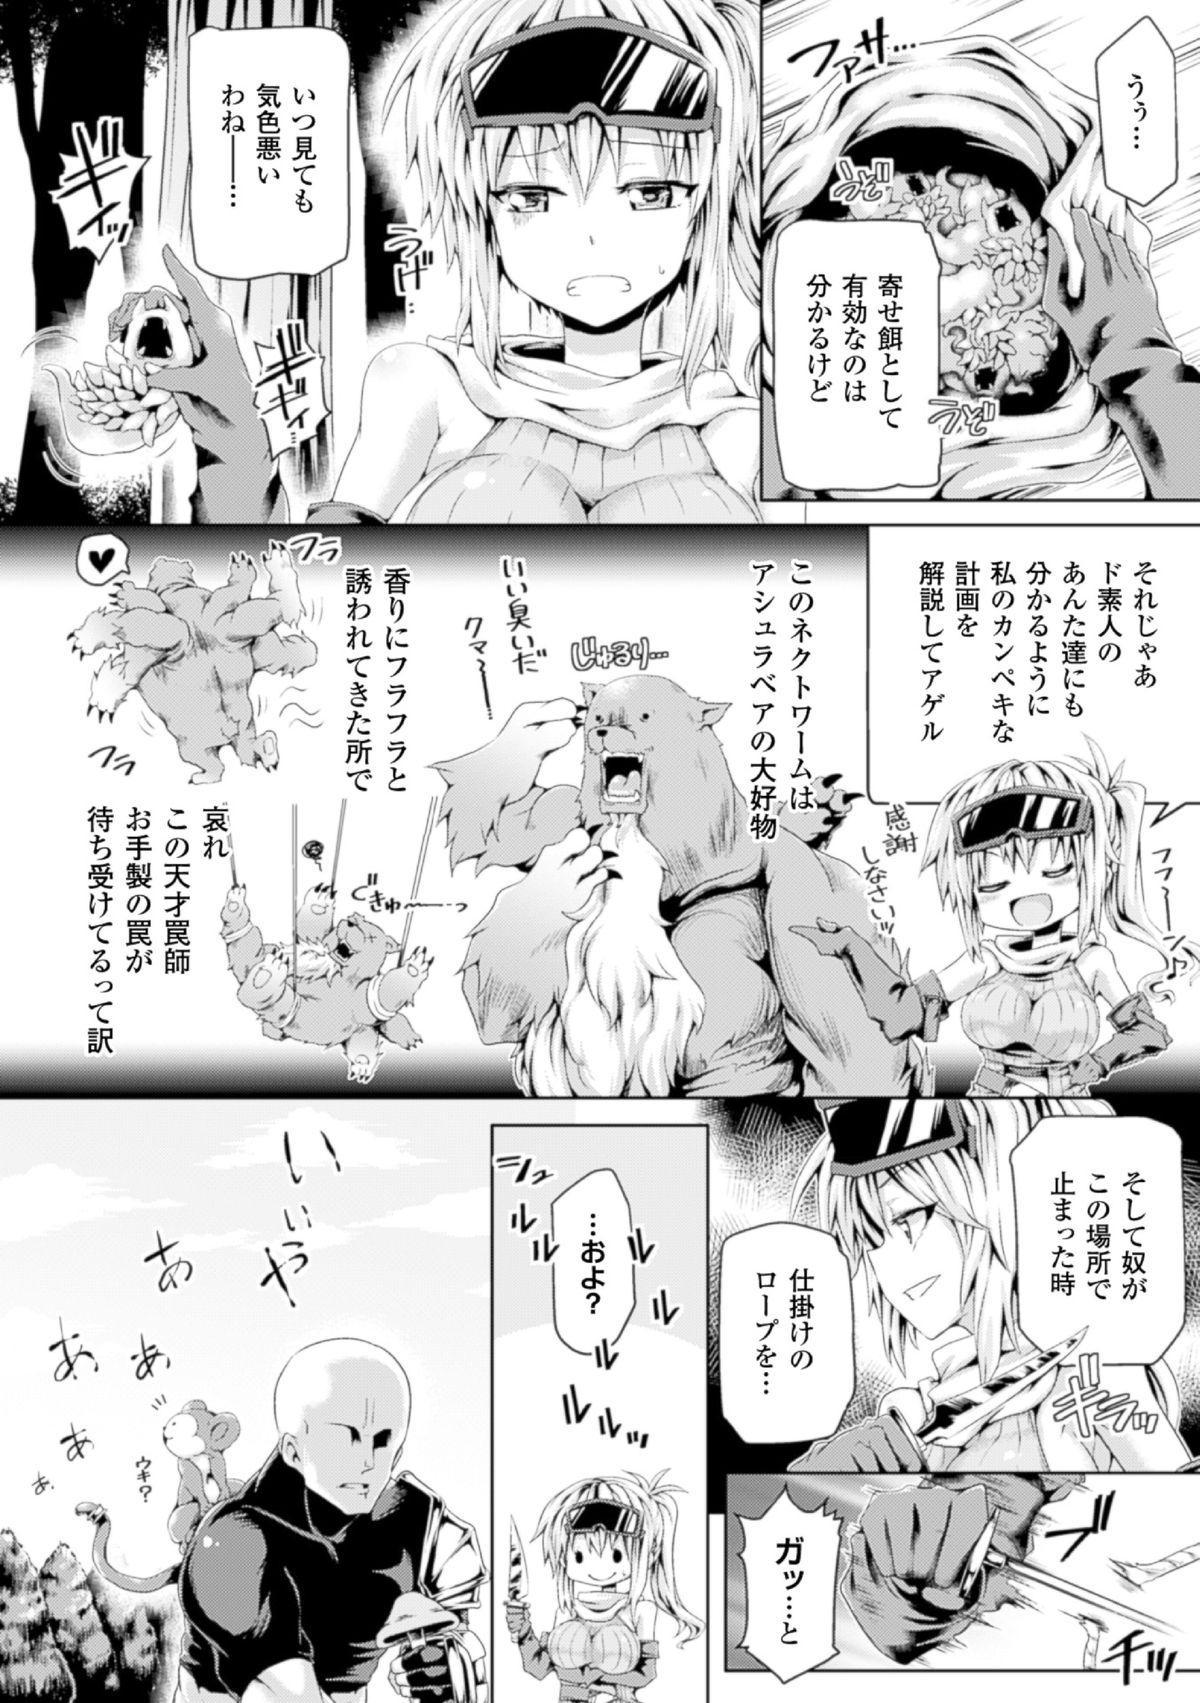 2D Comic Magazine Hunter Heroine AntholoG Vol.1 5